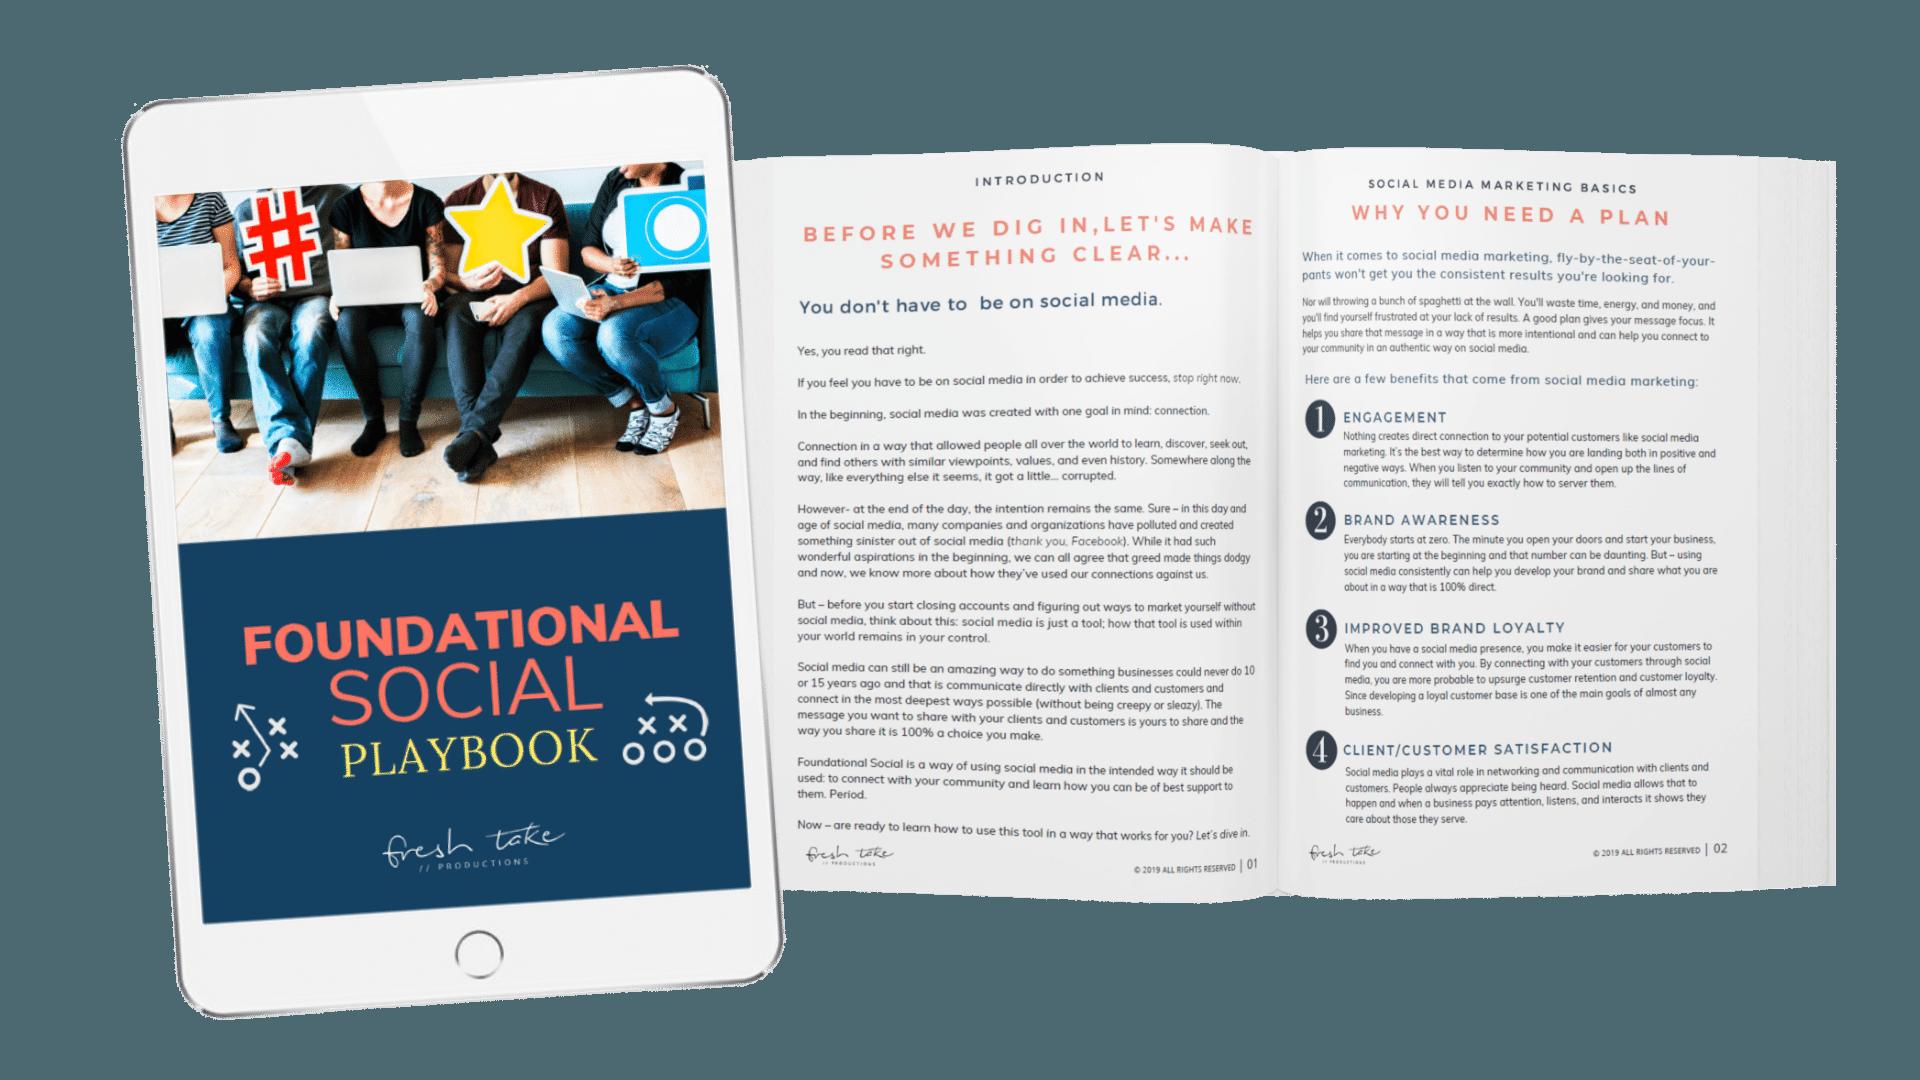 foundational social